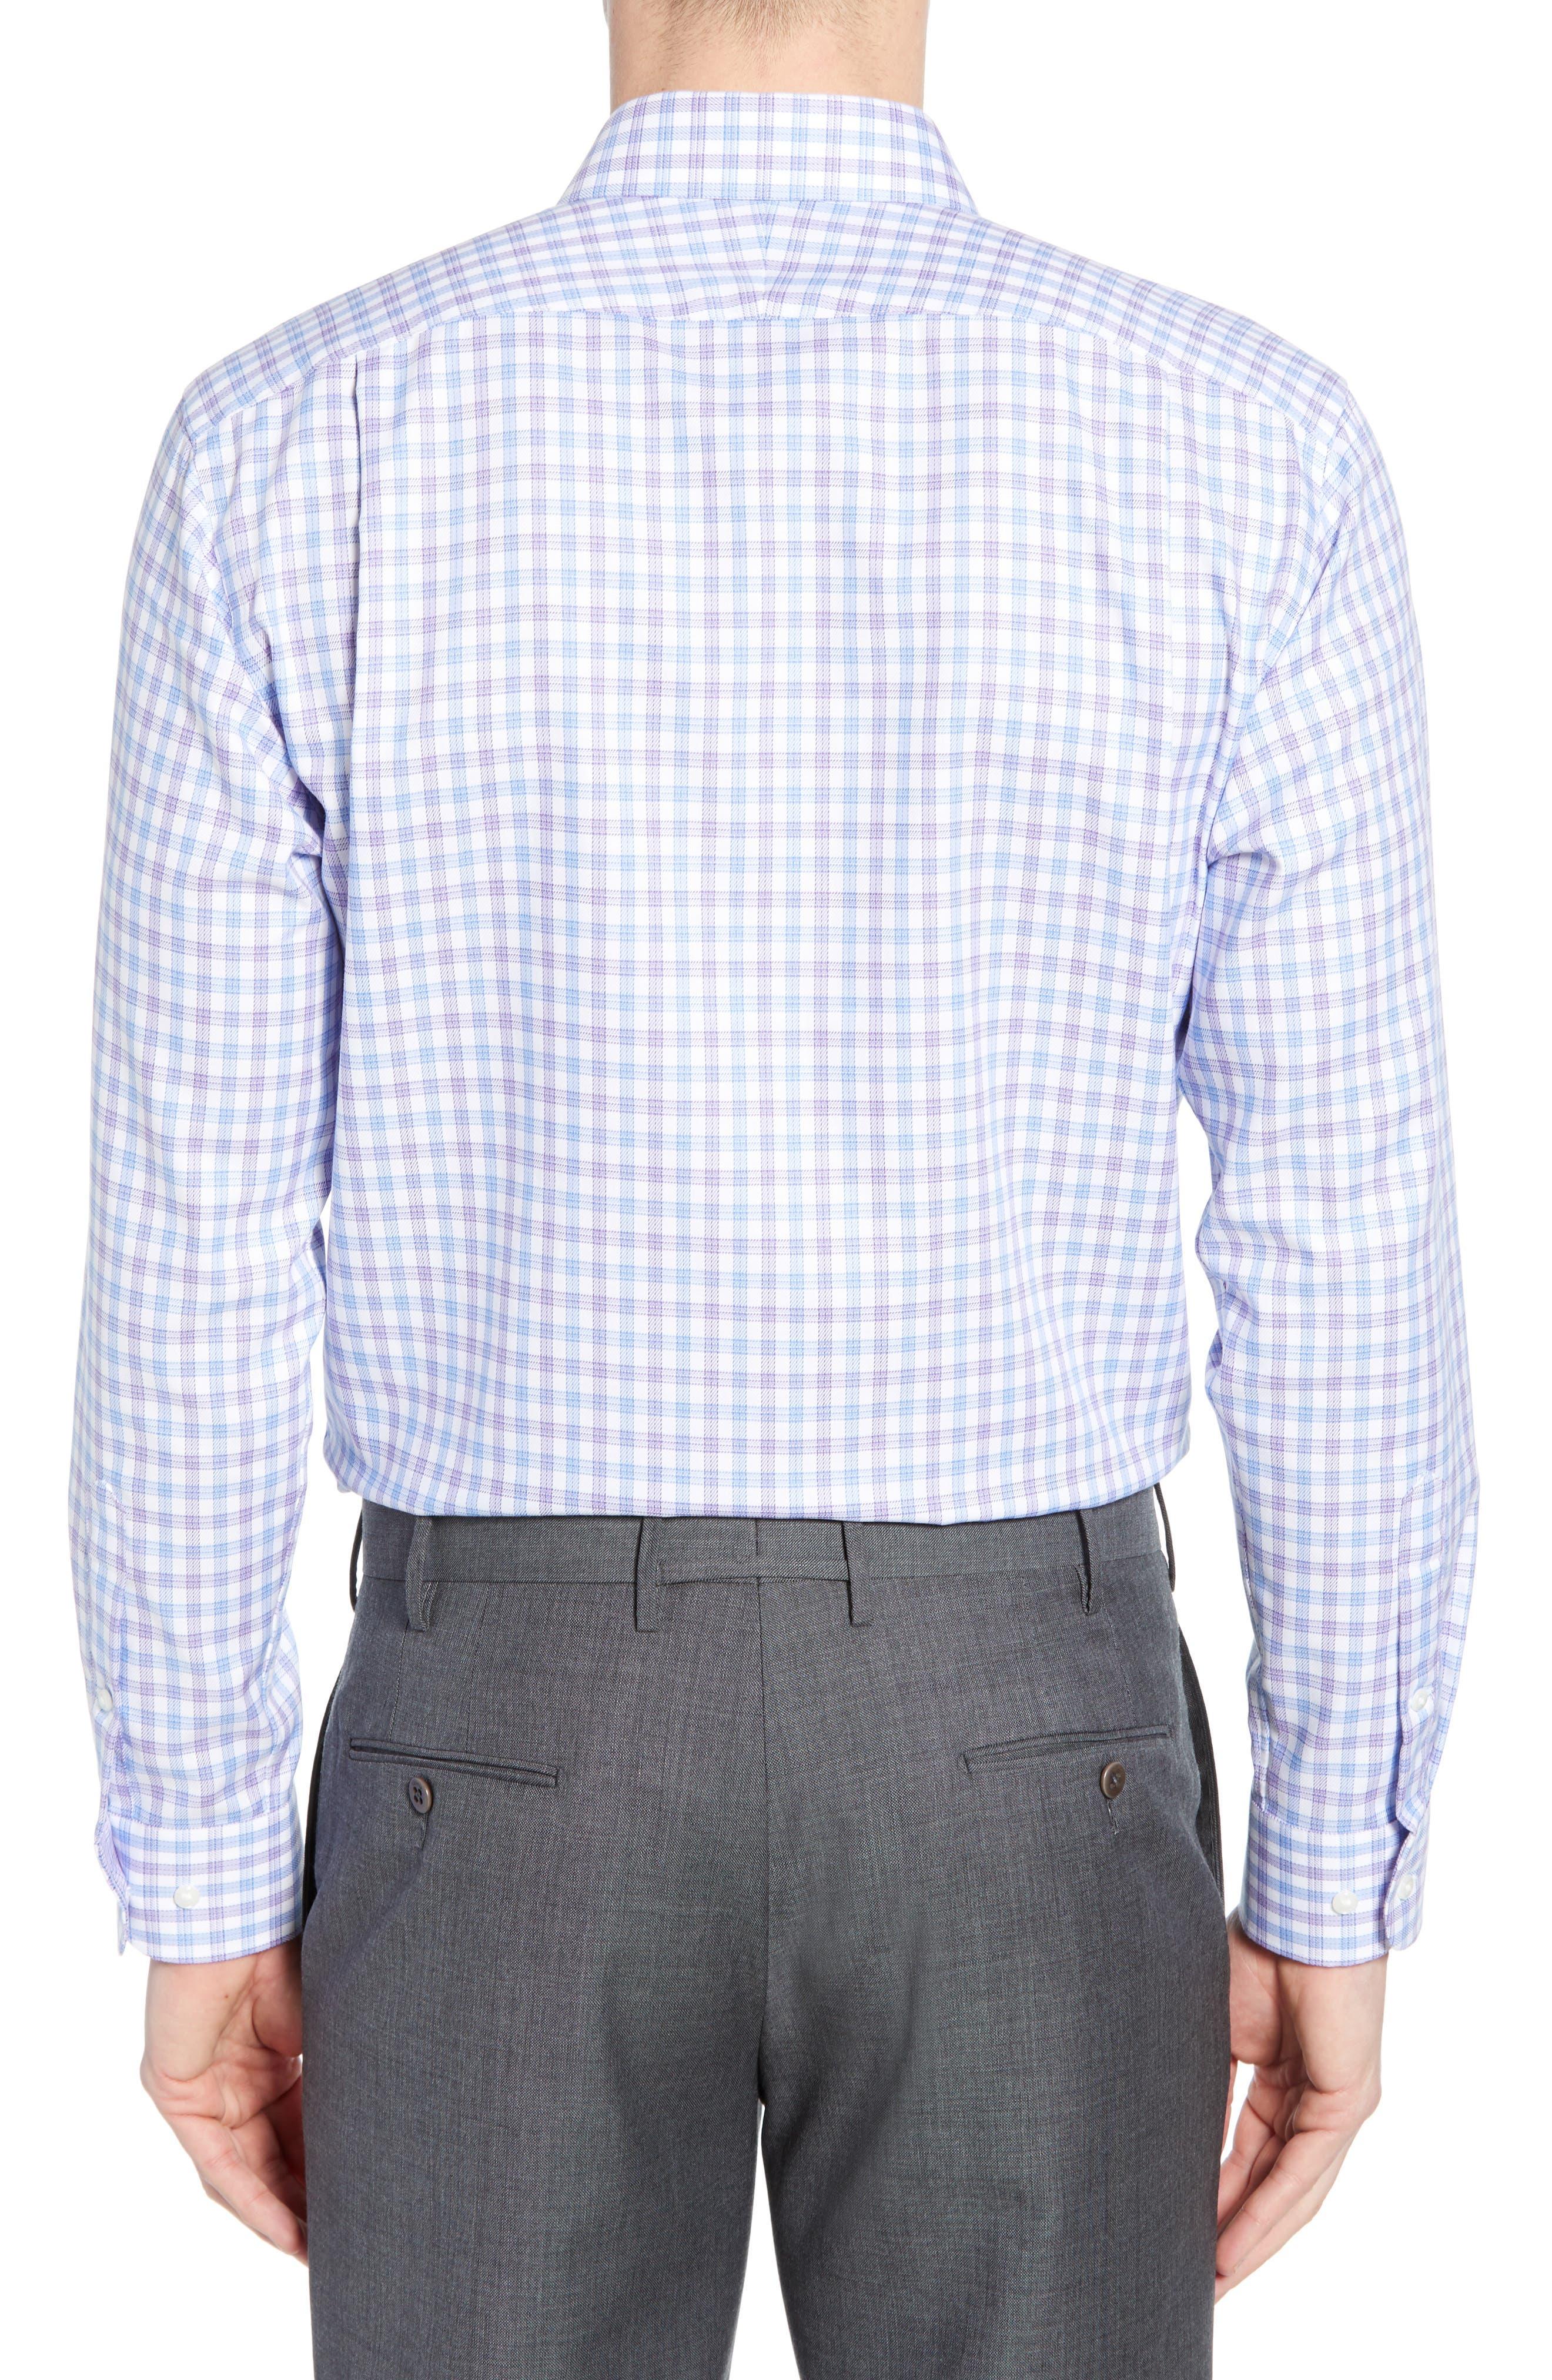 Tech-Smart Trim Fit Stretch Check Dress Shirt,                             Alternate thumbnail 3, color,                             RED SAUCY